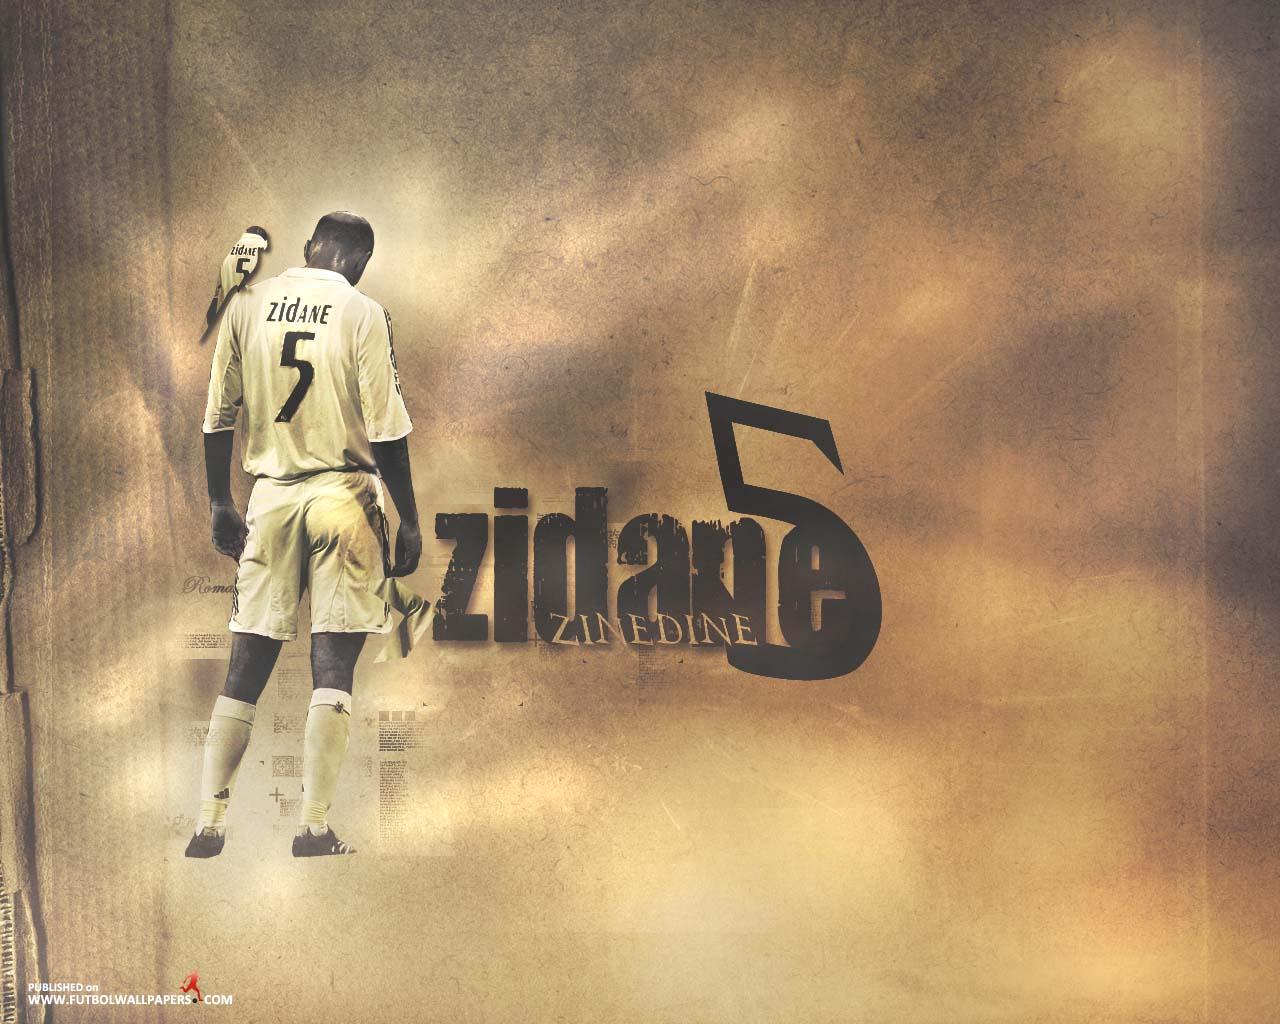 http://1.bp.blogspot.com/_gk7rxlPA3bo/TThXXPiPSpI/AAAAAAAABgo/LU01QcDRQlE/s1600/Zinedine_Zidane_wallpaper+%25281%2529.jpg